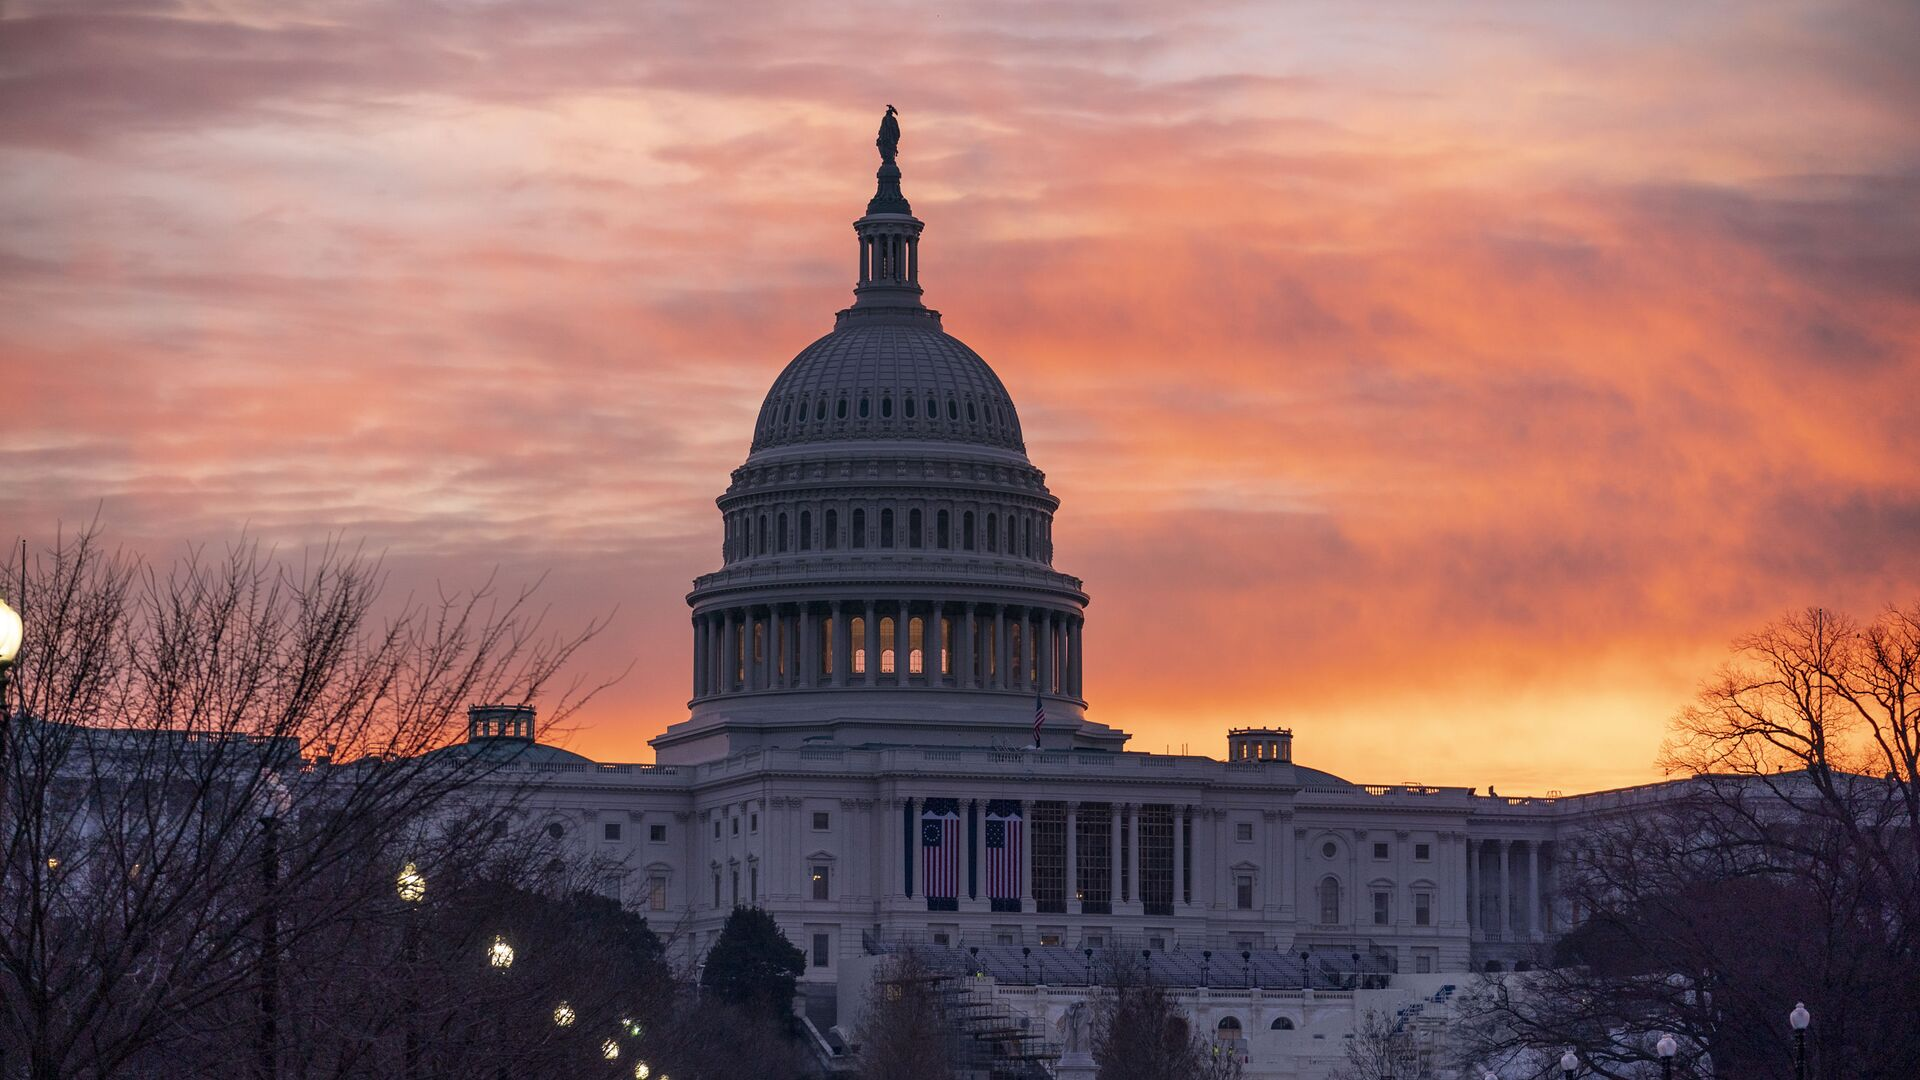 Зграда америчког Конгреса у Вашингтону - Sputnik Србија, 1920, 24.09.2021